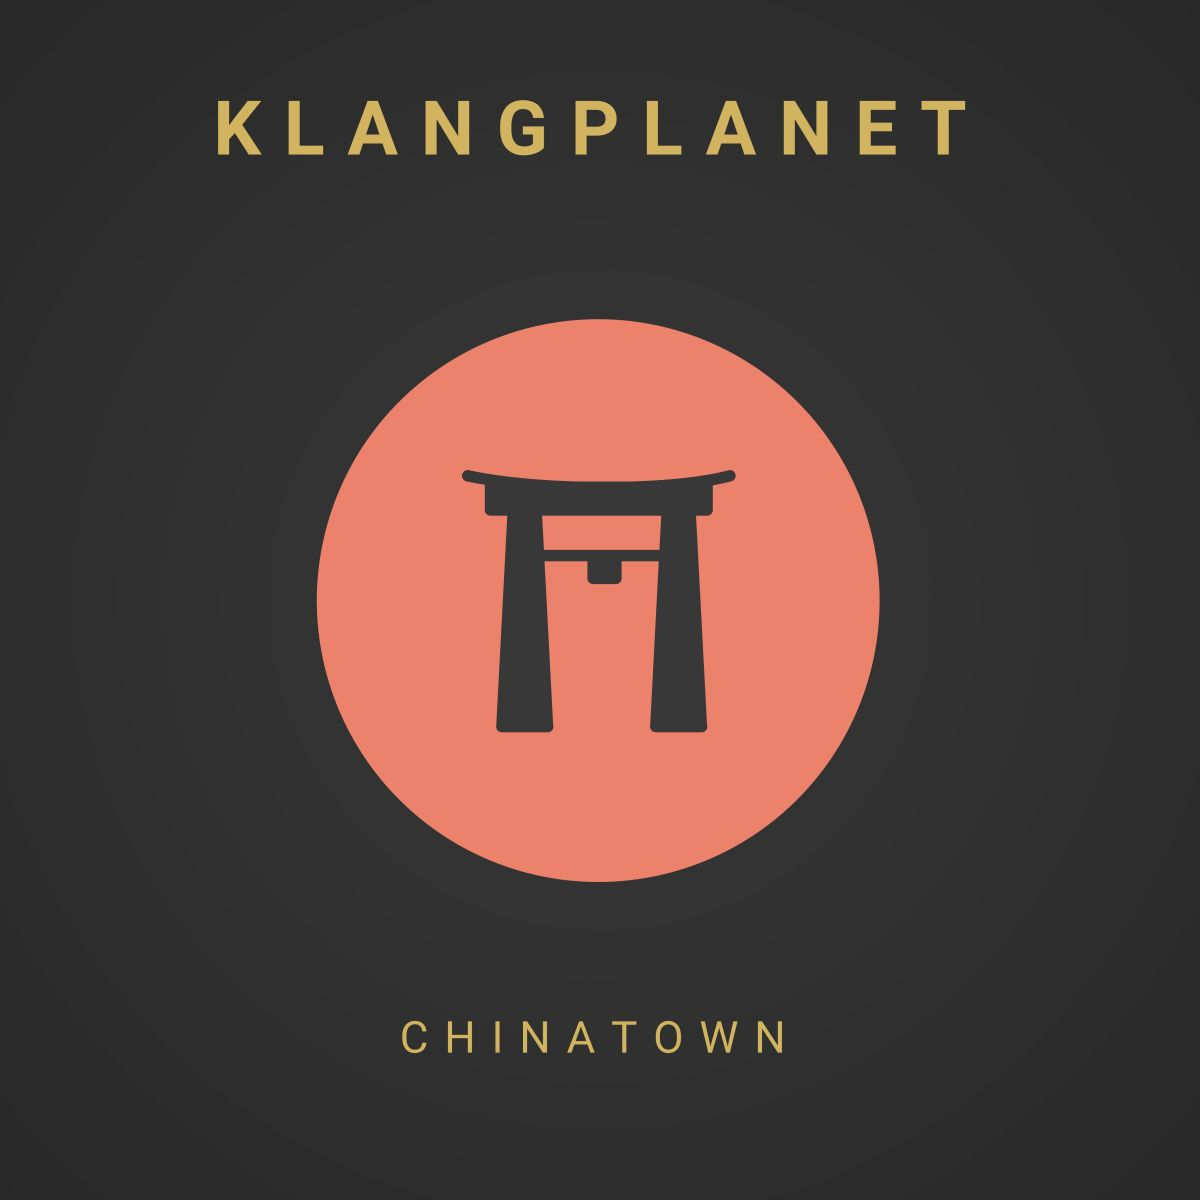 KLANGPLANET - Chinatown [Deep house]